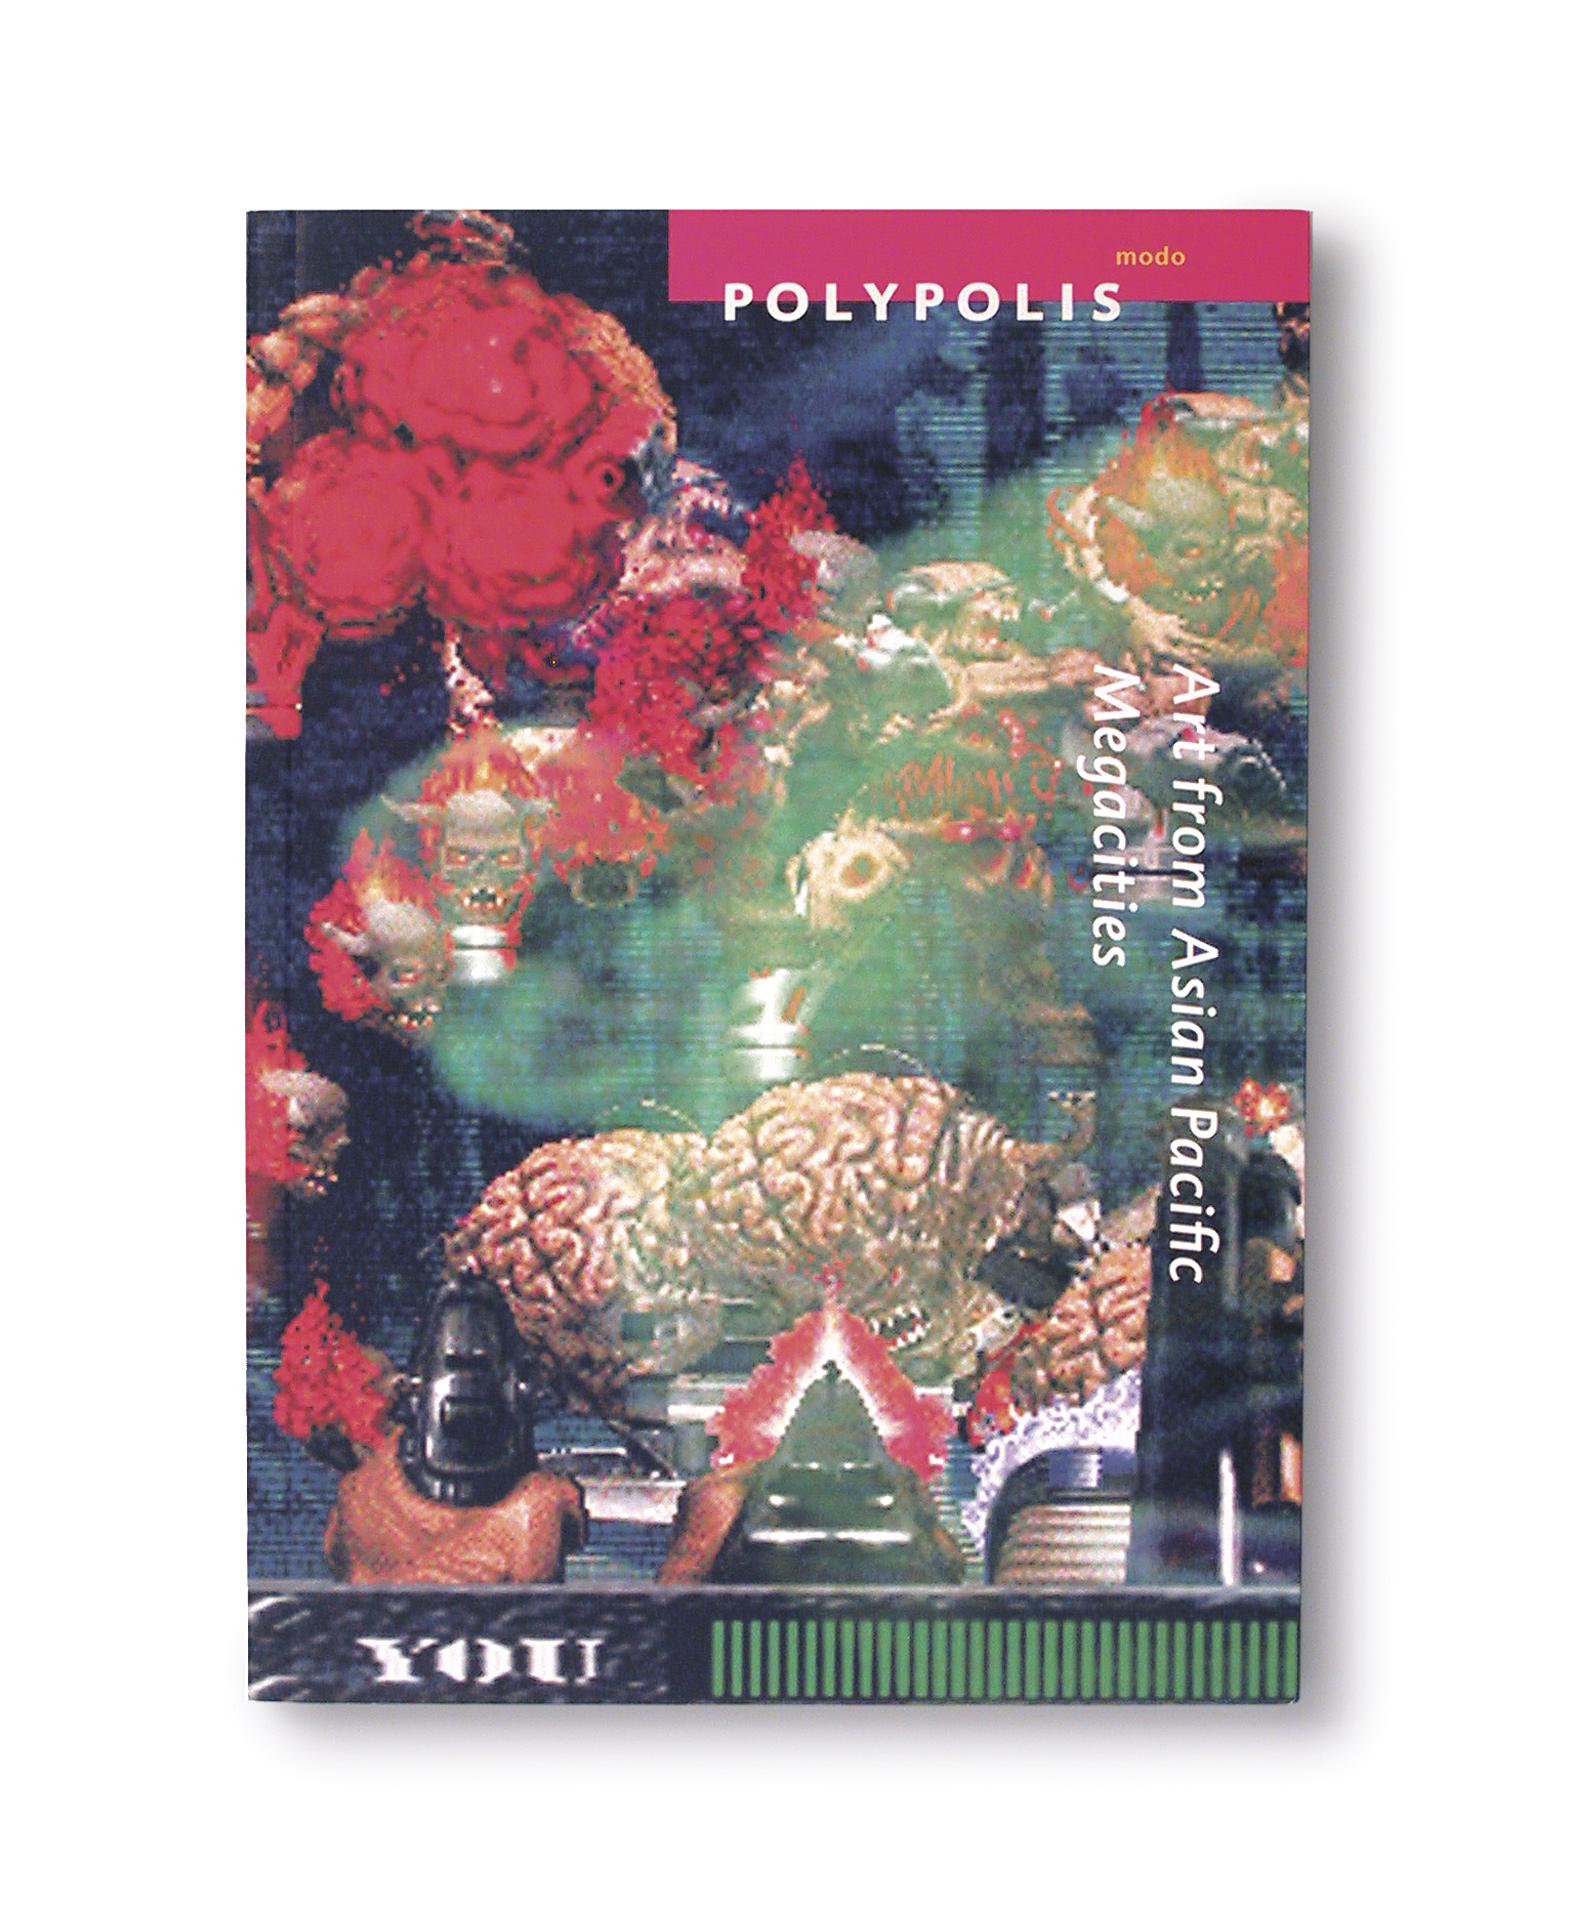 2000_Polypolis